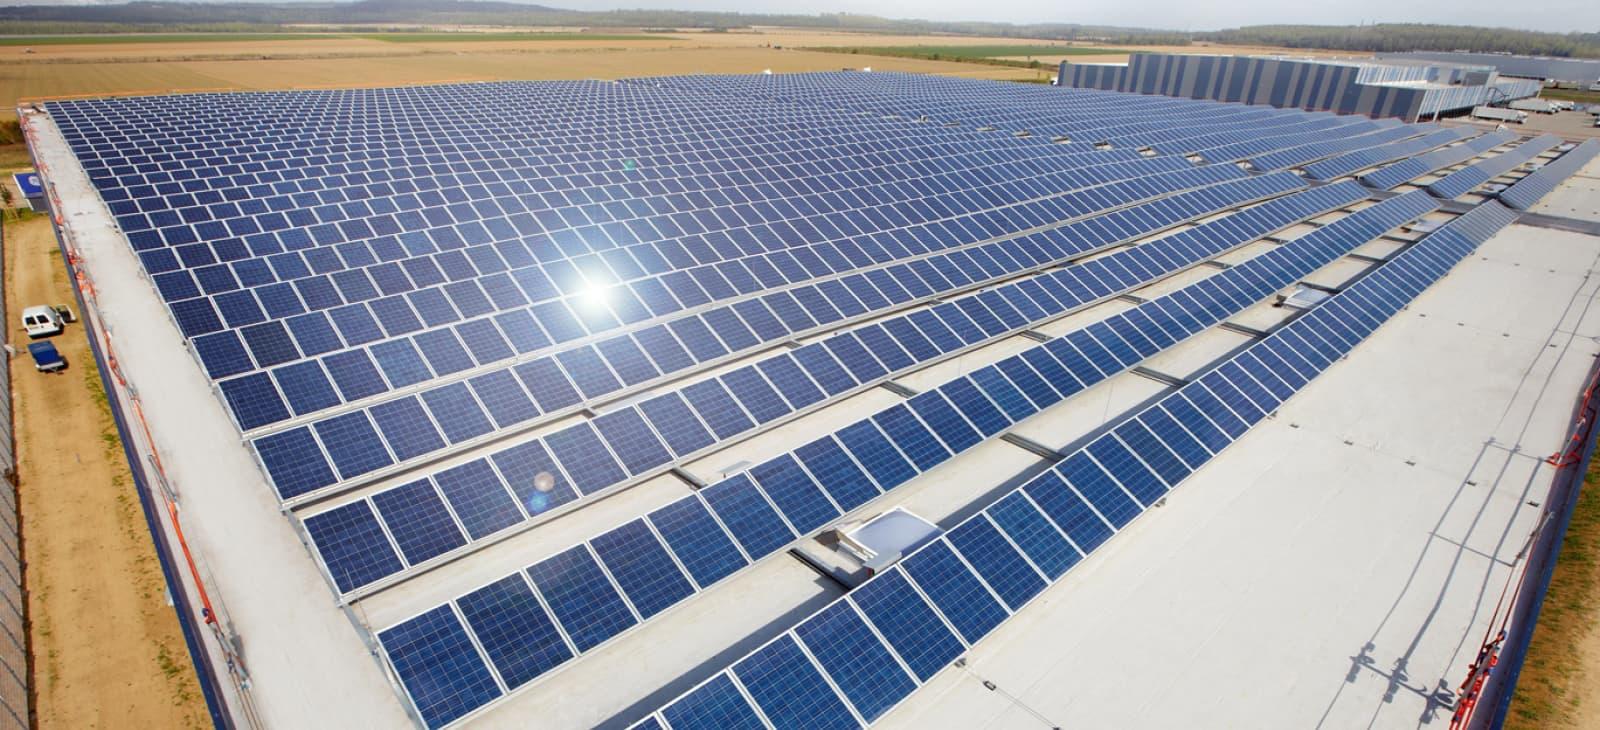 GOLDBECK SOLAR Solar Dach DE